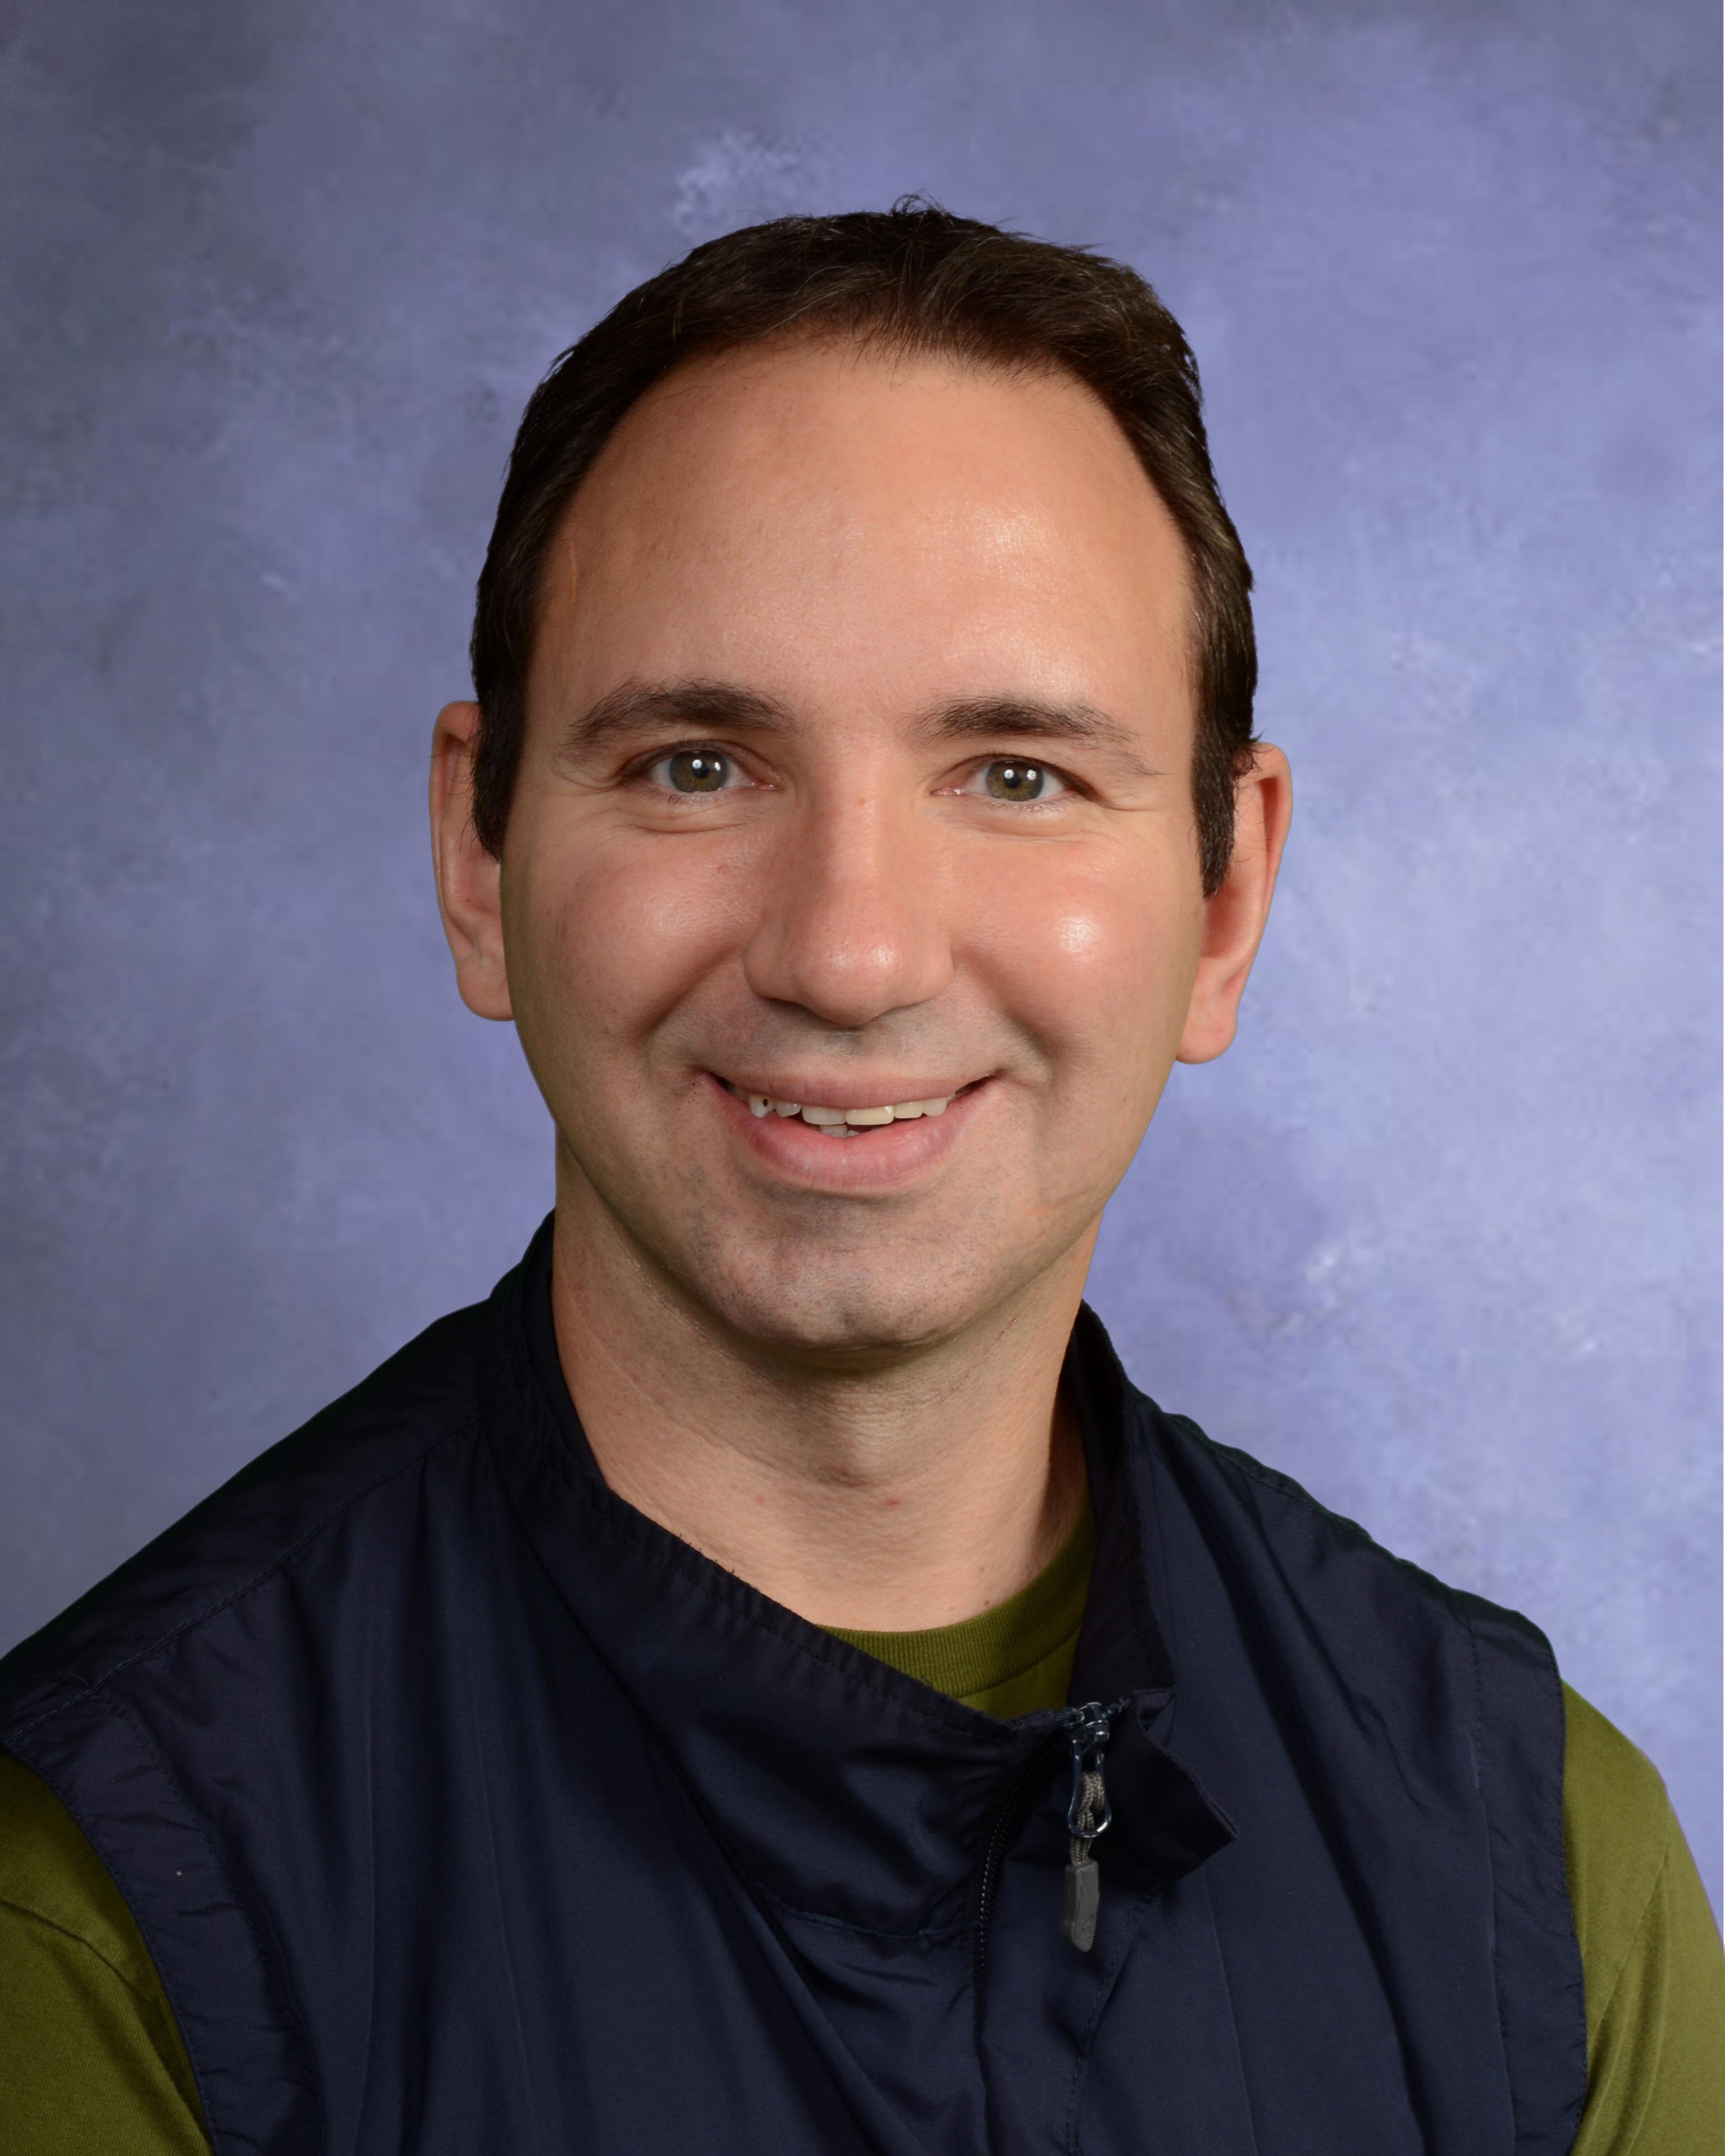 Scott Kostecki, B. Ed.